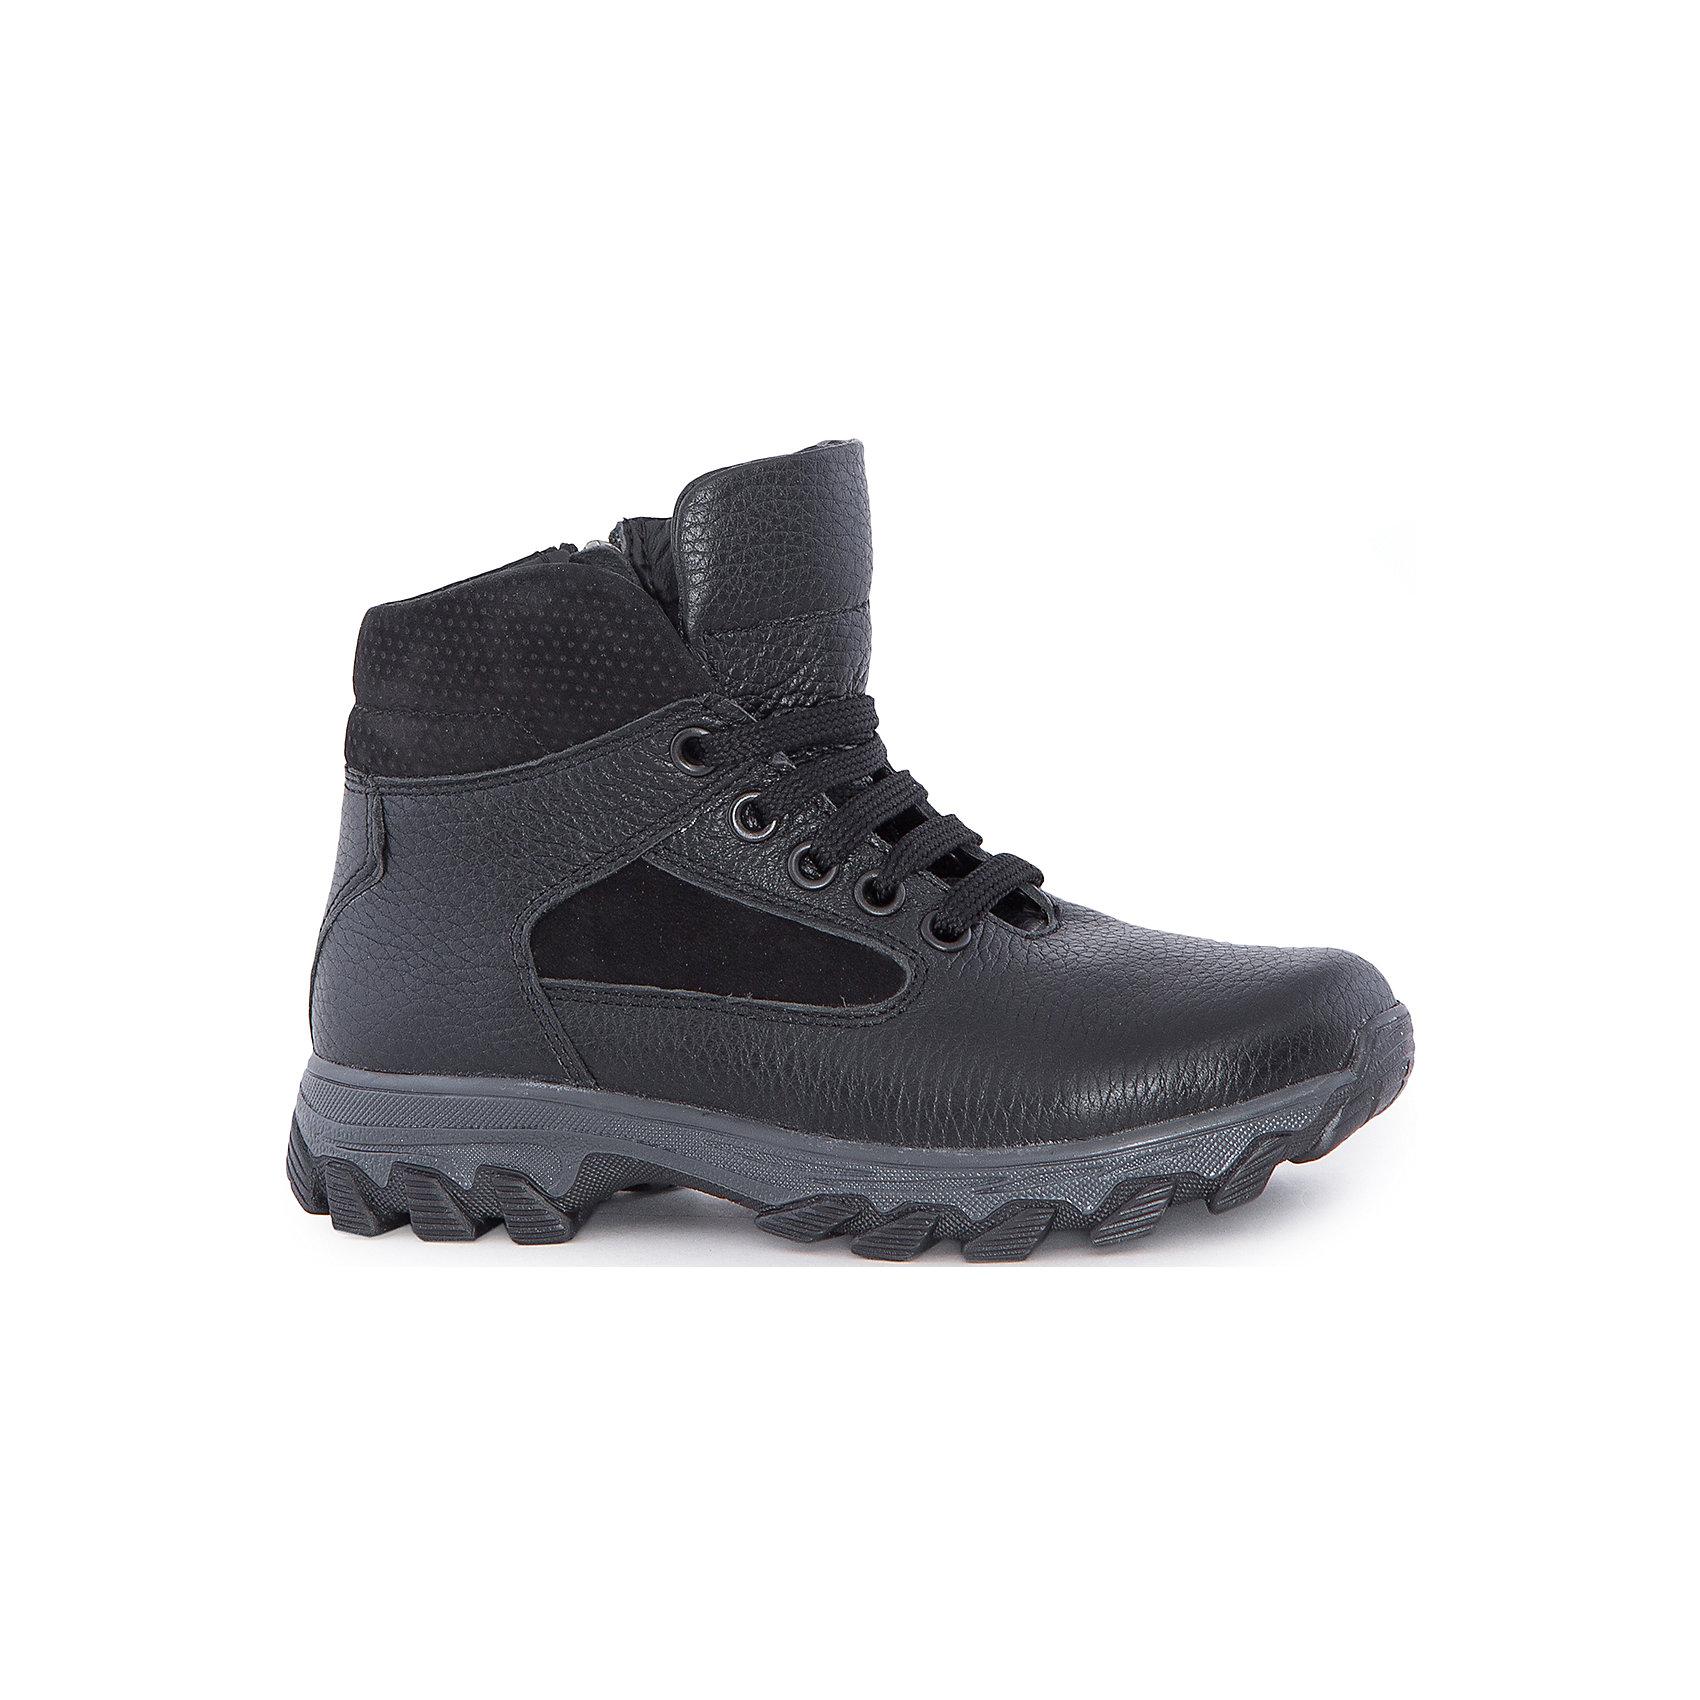 MURSU Ботинки для мальчика Mursu ботинки mursu 200743 черный р 39